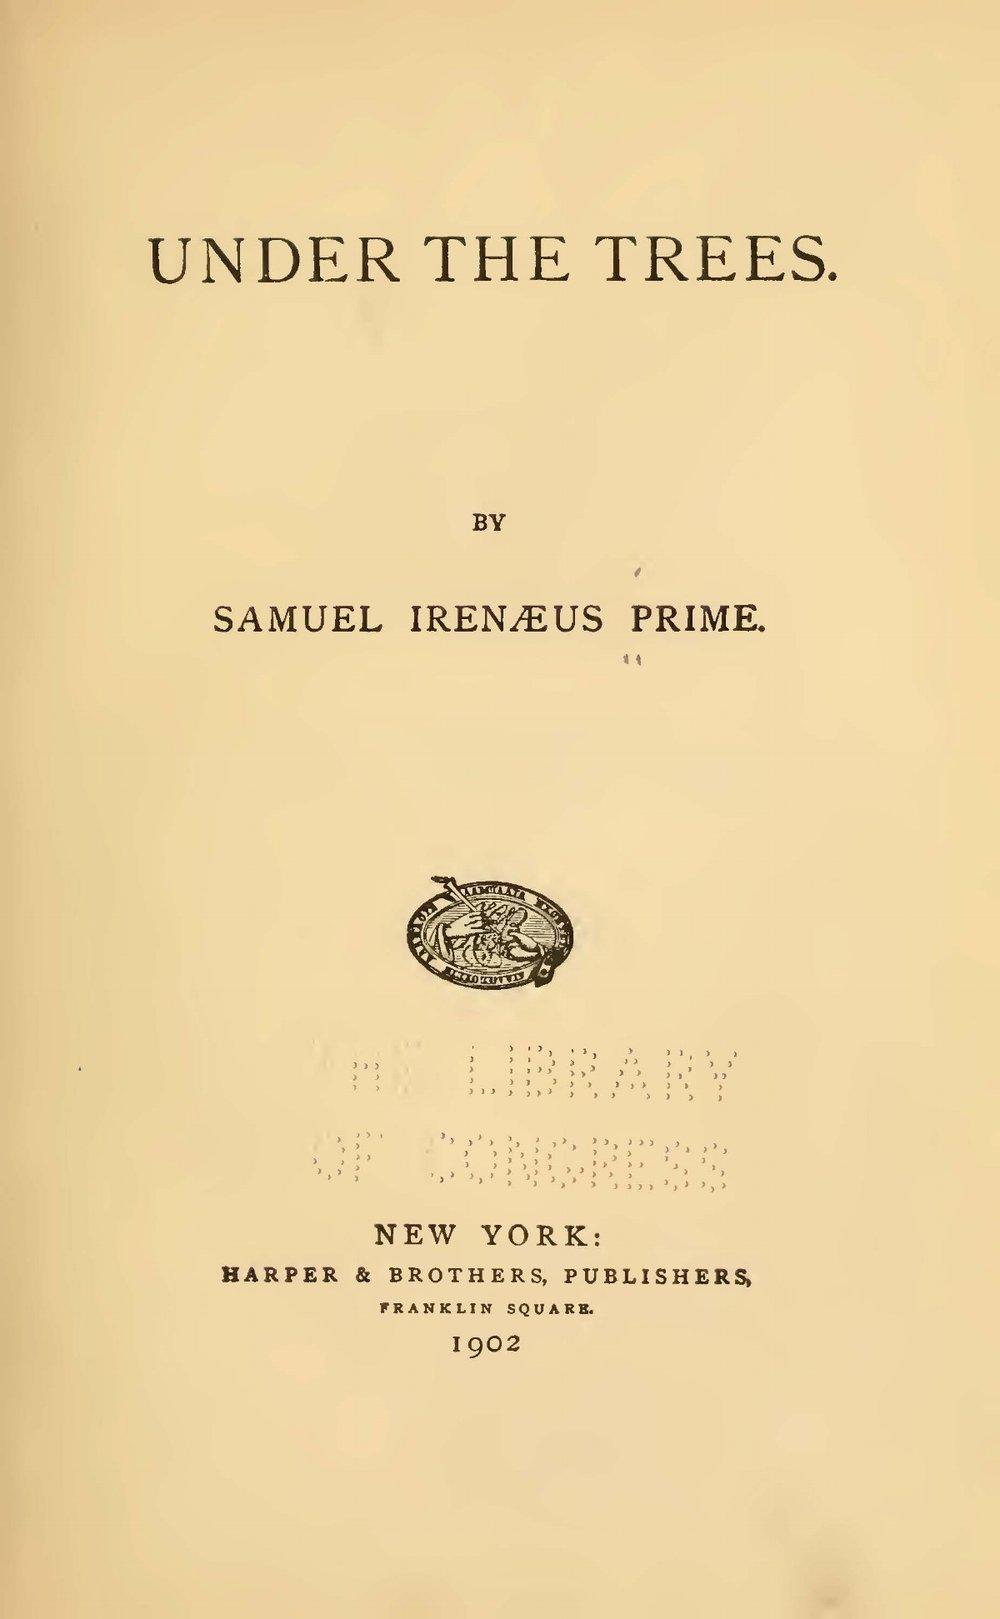 Prime, Samuel Irenaeus, Under the Trees Title Page.jpg